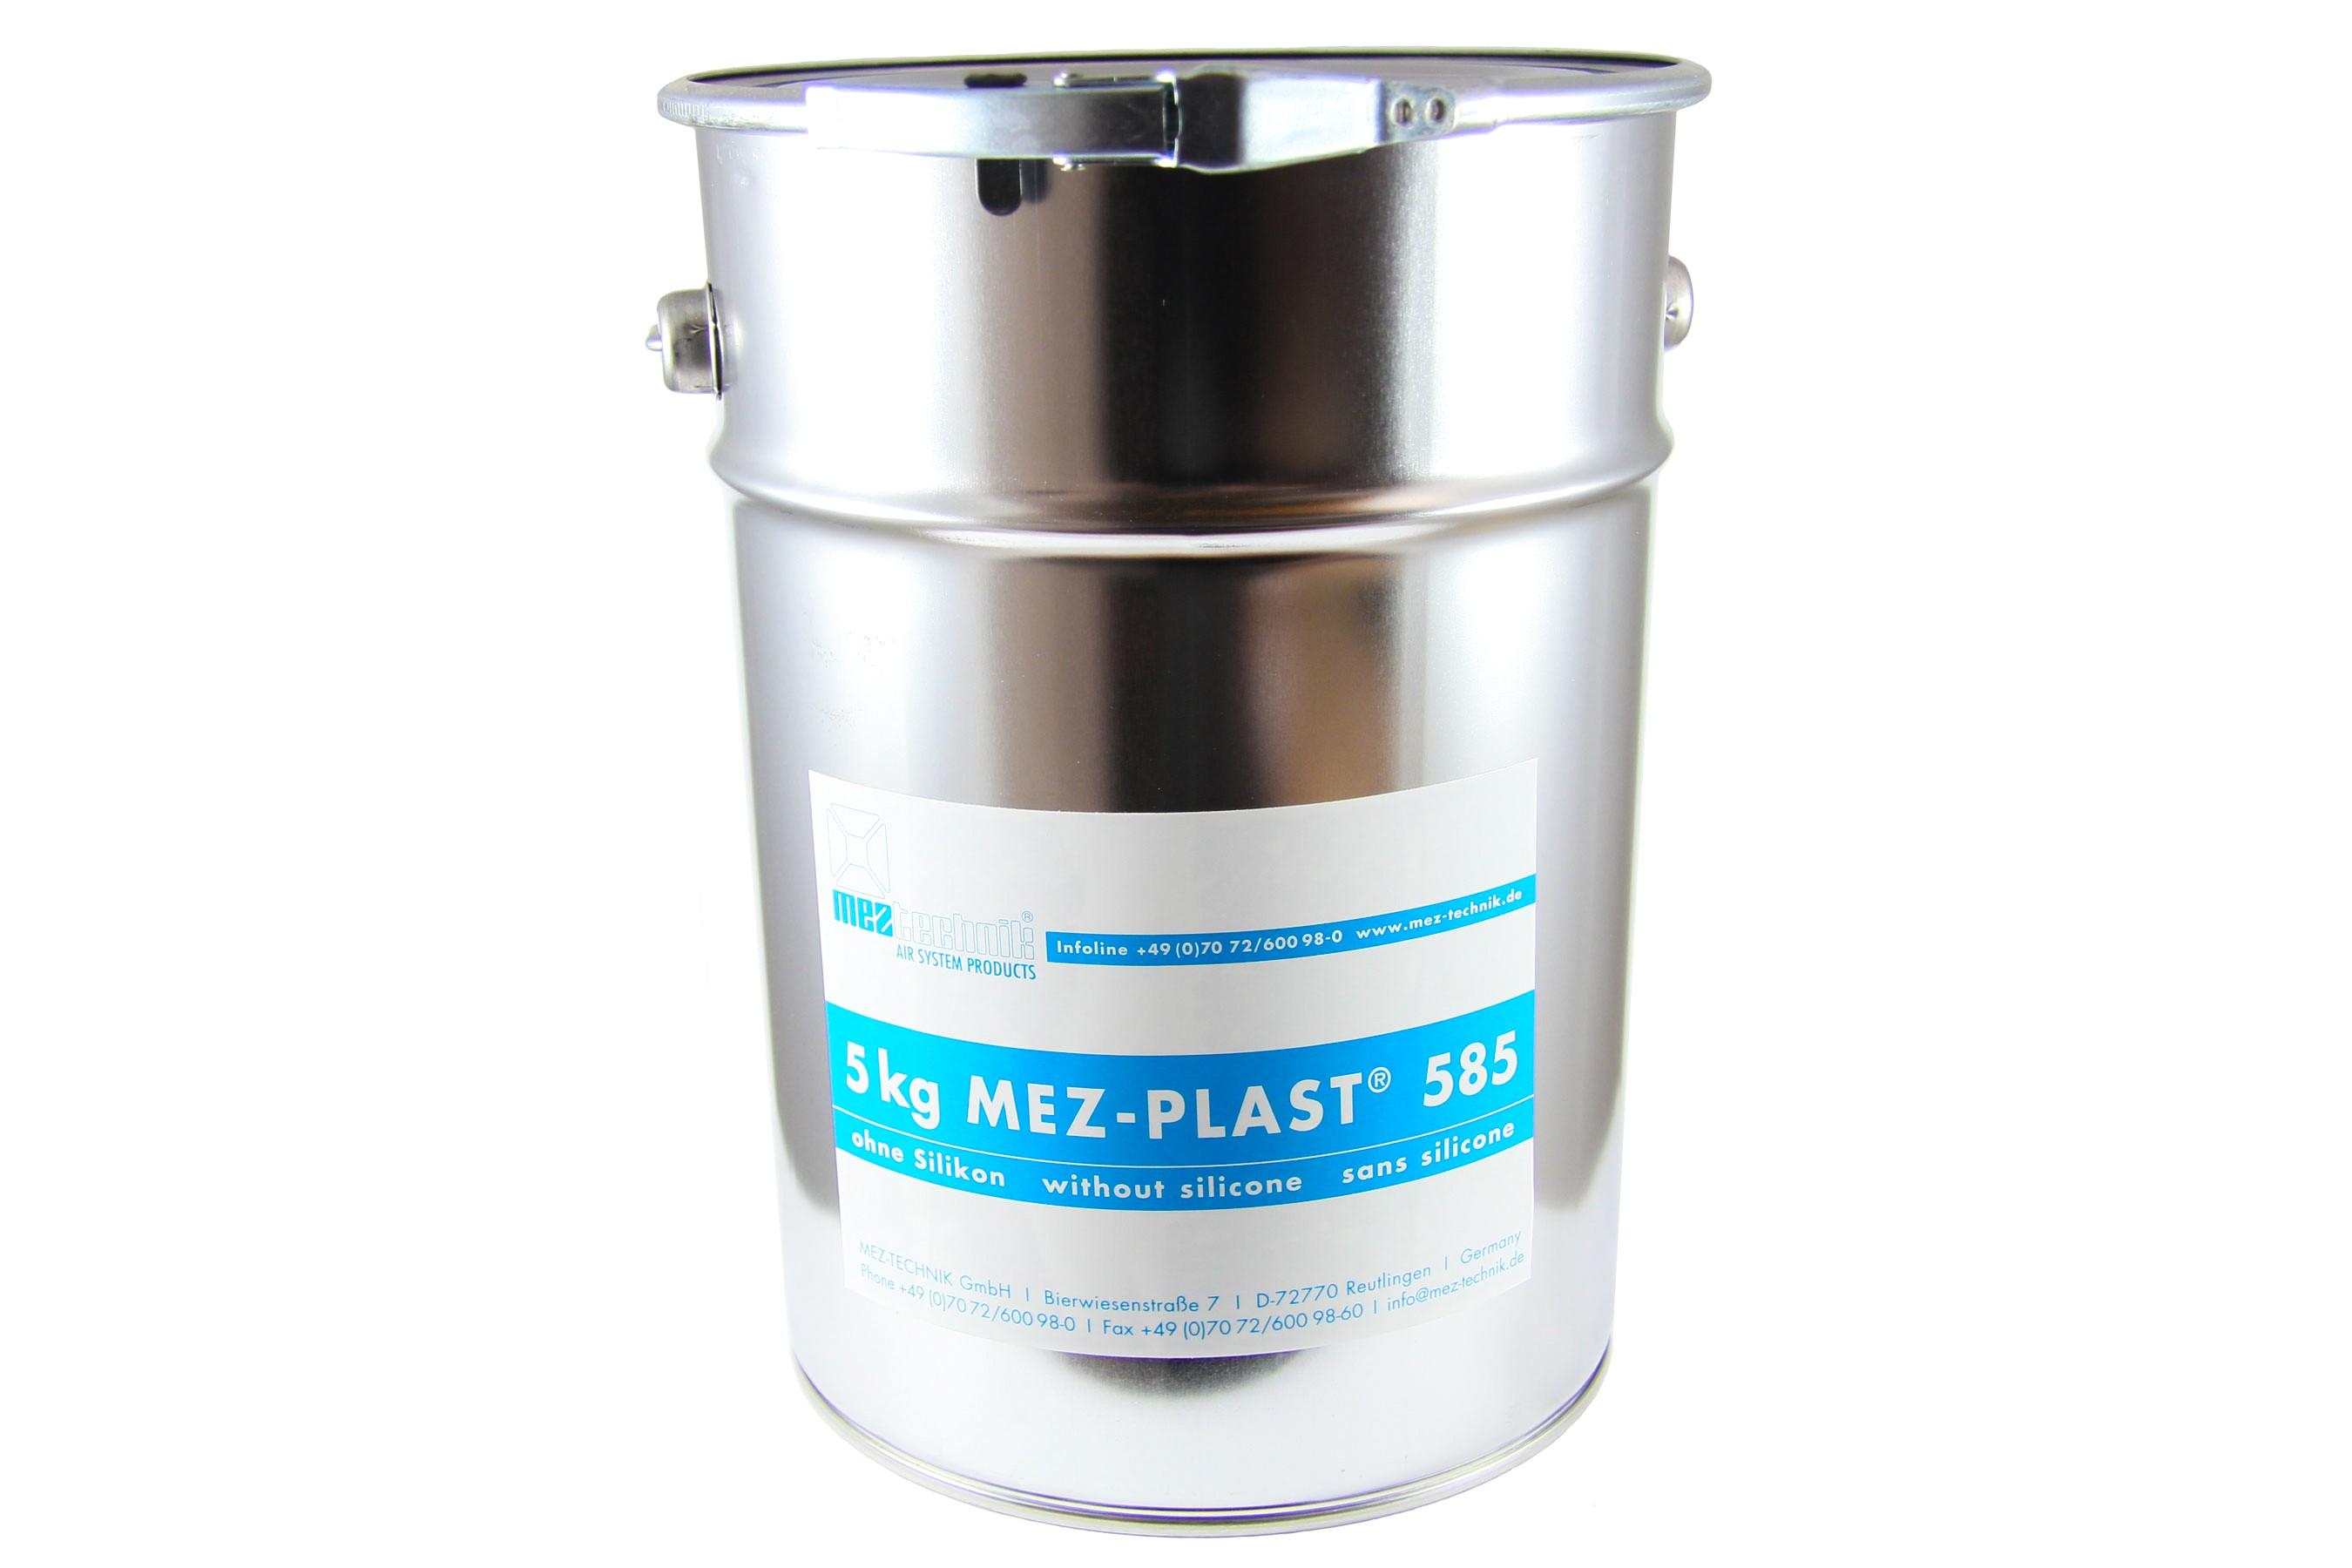 MEZ-PLAST 580